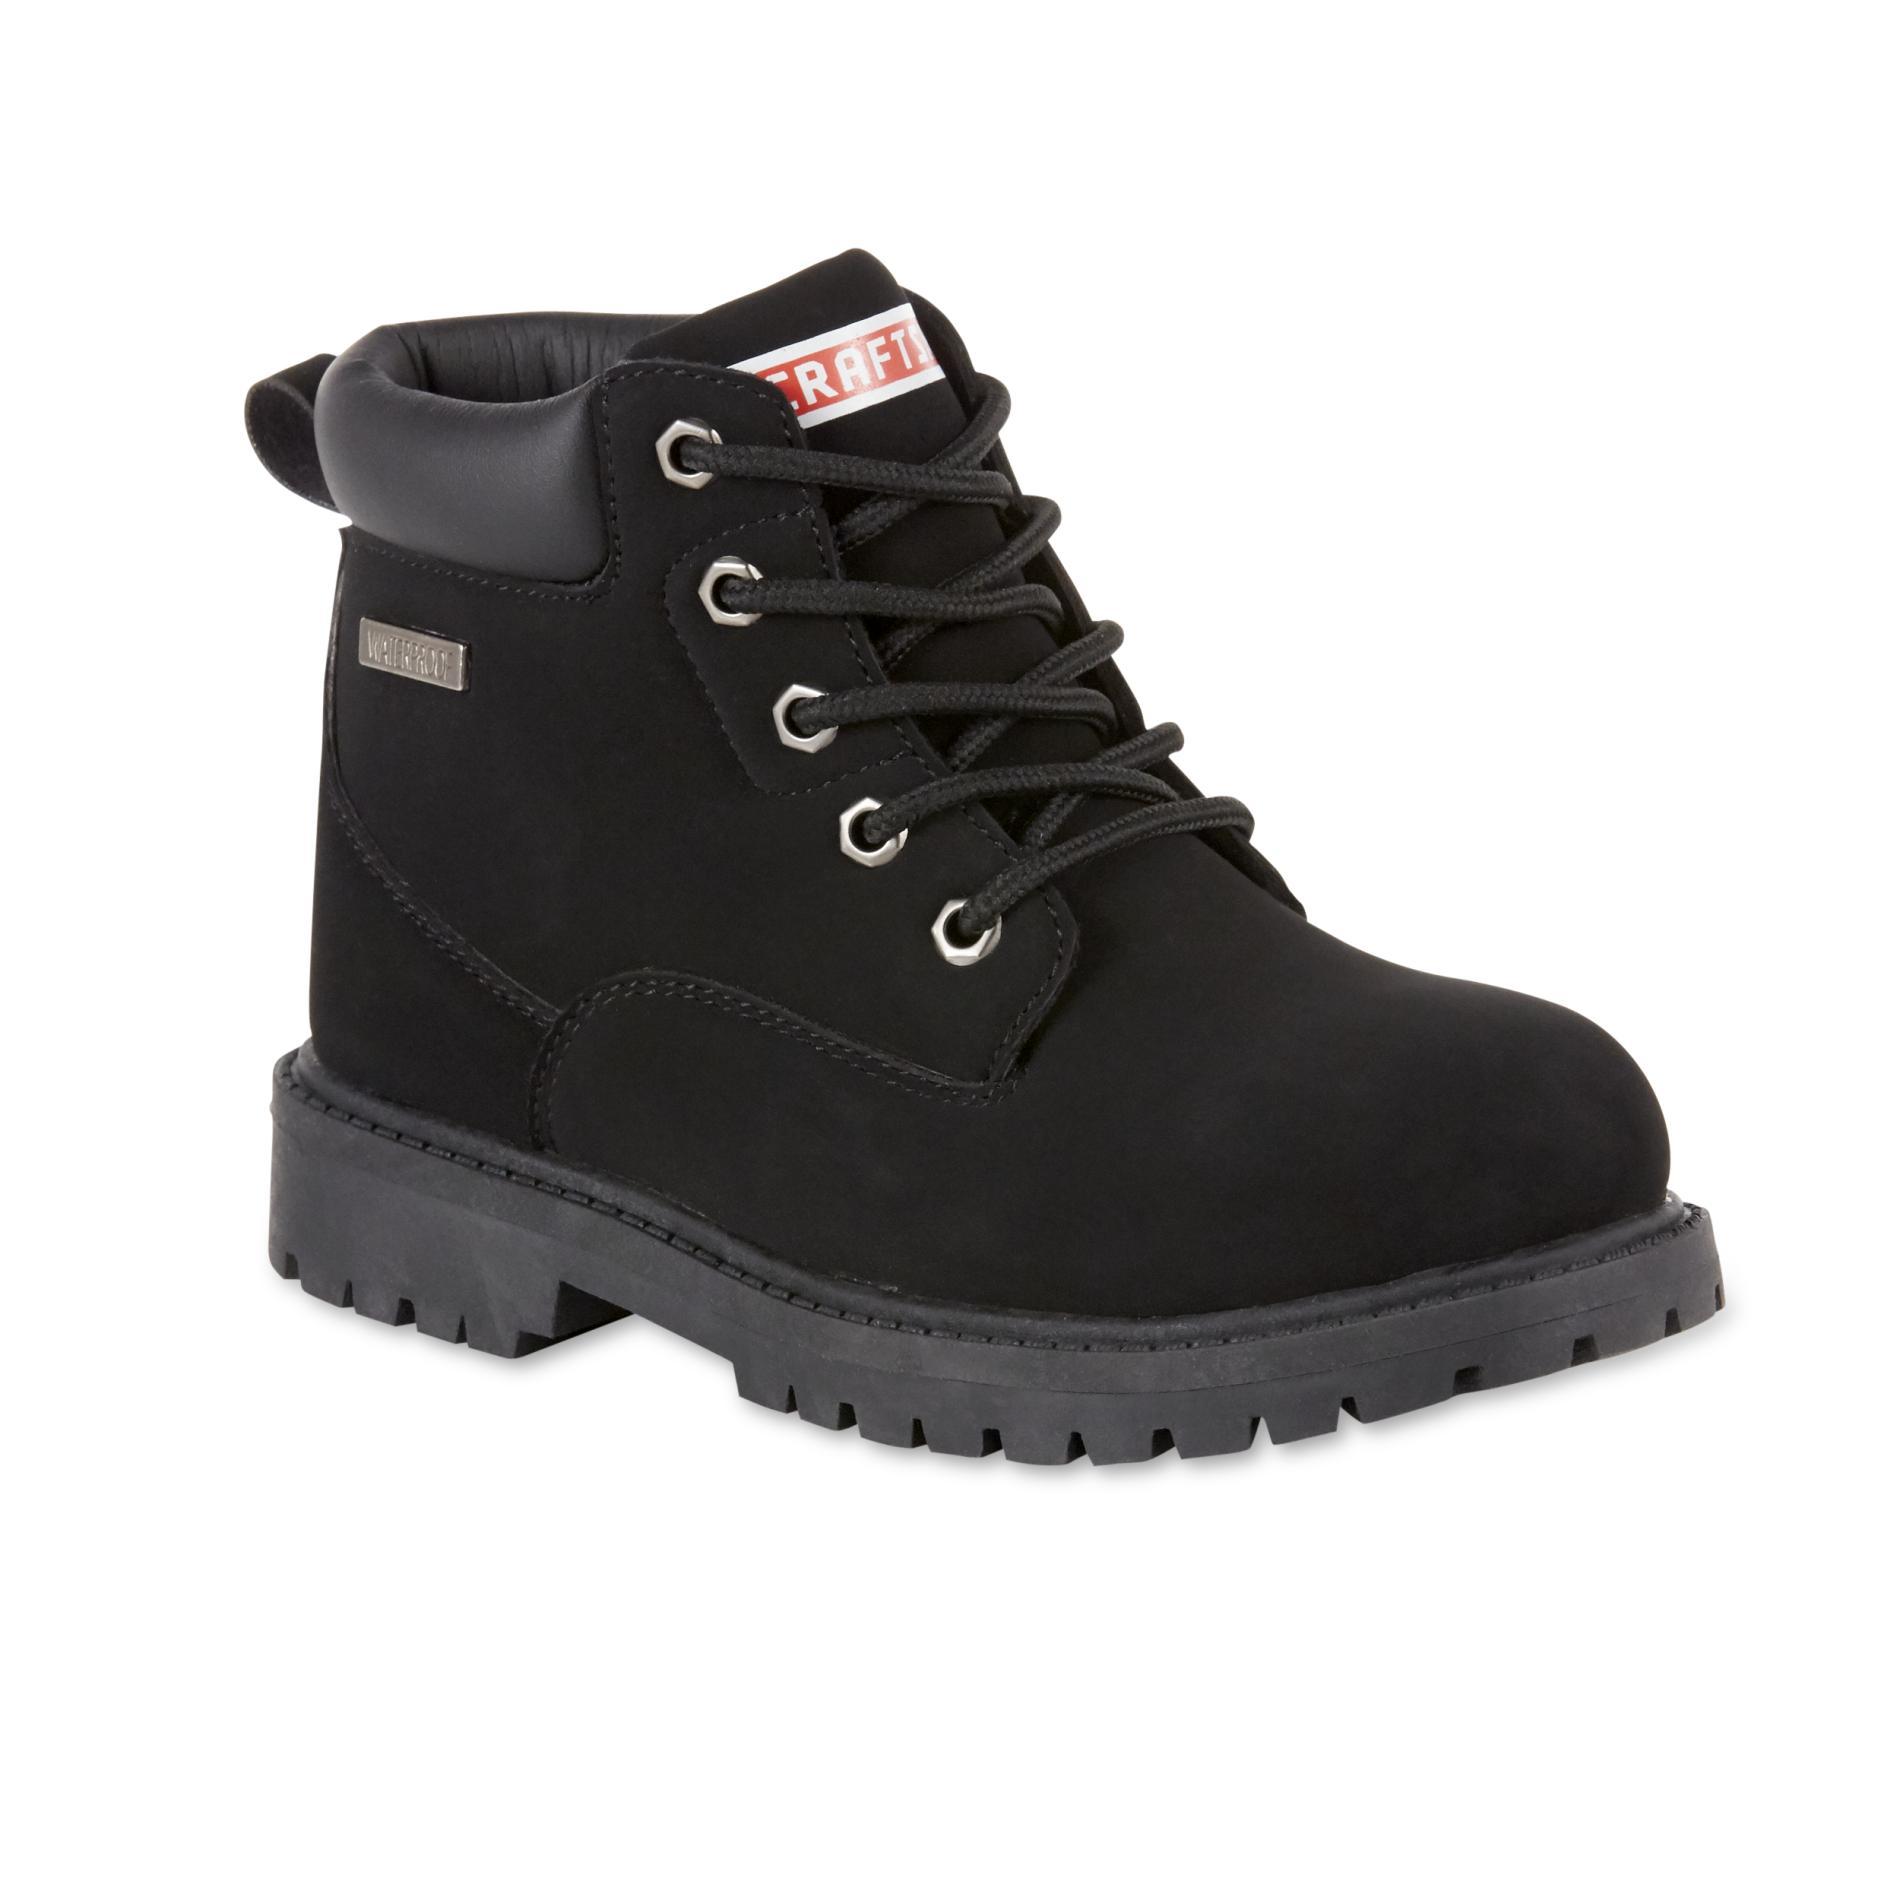 Craftsman Boys' Black Tom Waterproof Lace-Up Boot PartNumber: 035VA99394112P MfgPartNumber: 11984